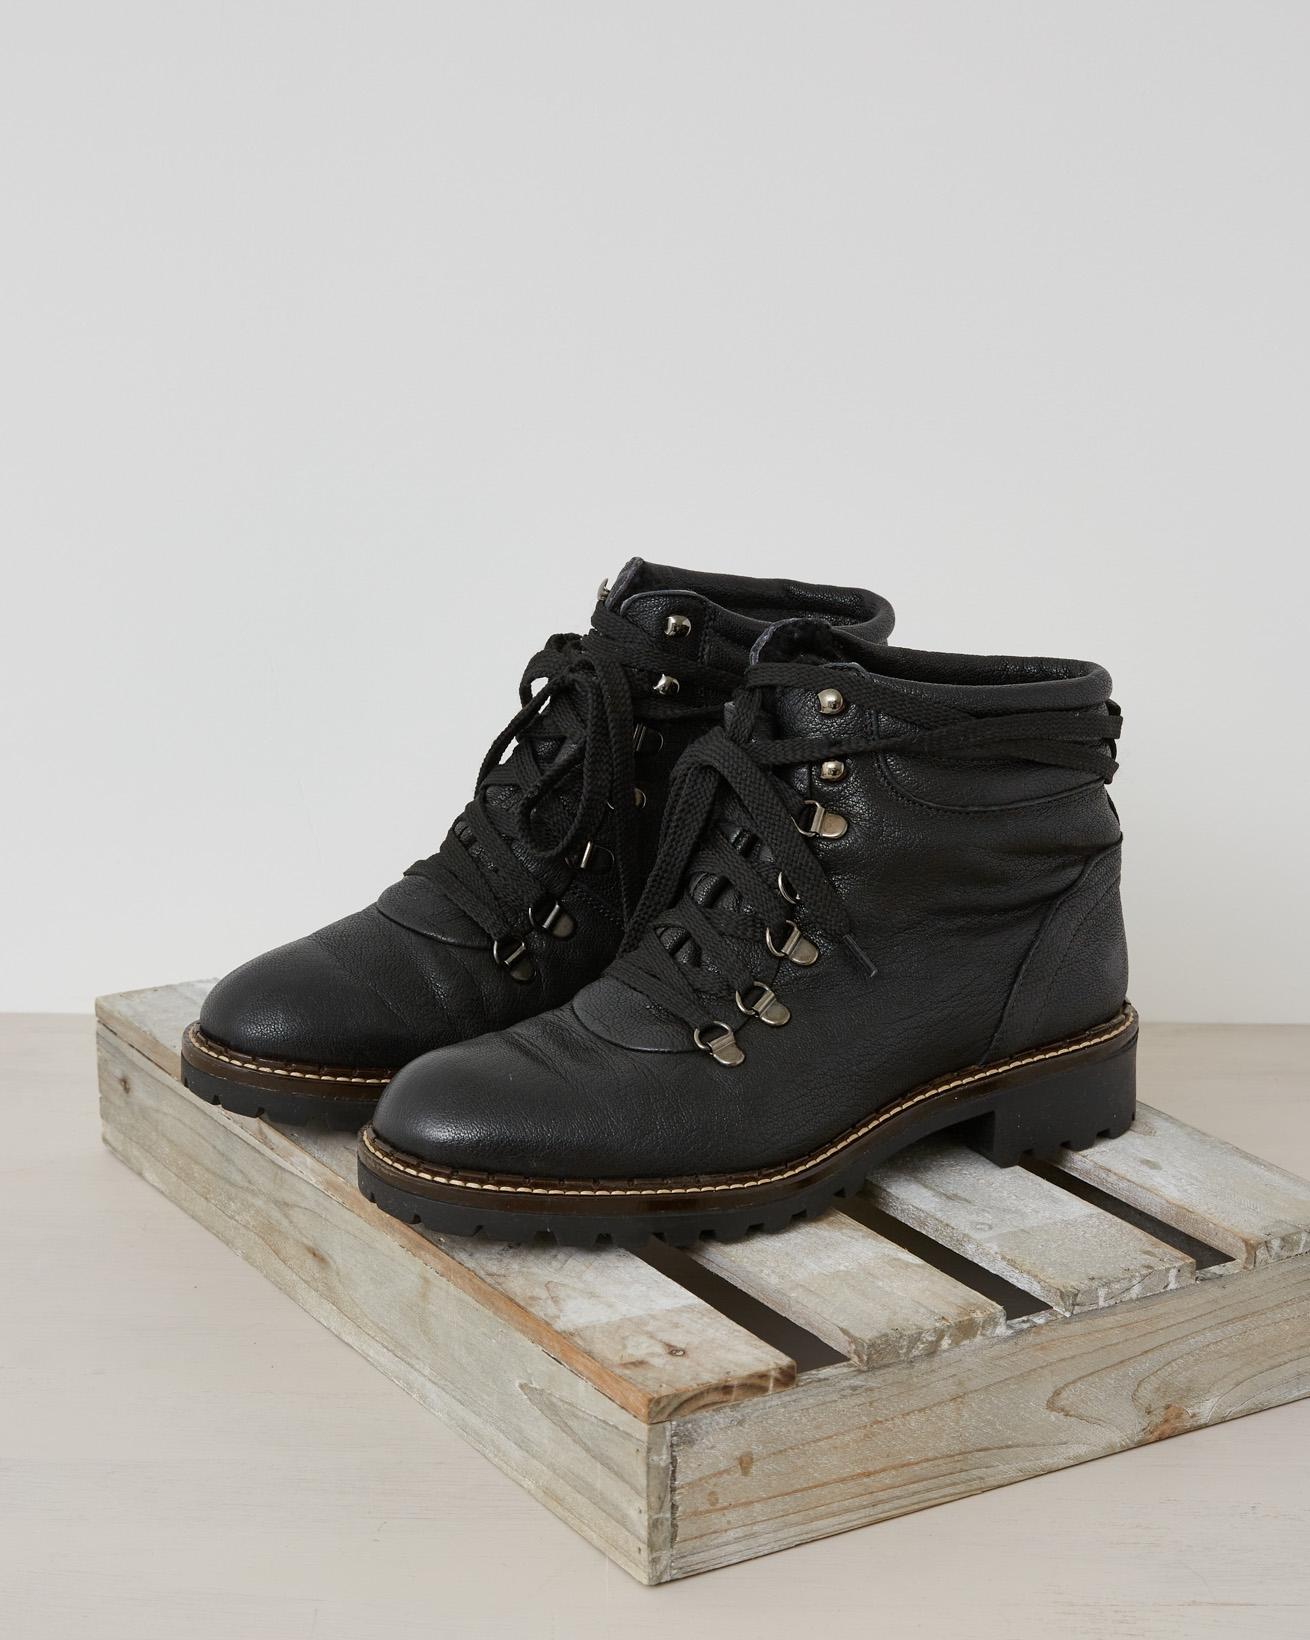 Hiker Boot - Black - Size 38 - 2541